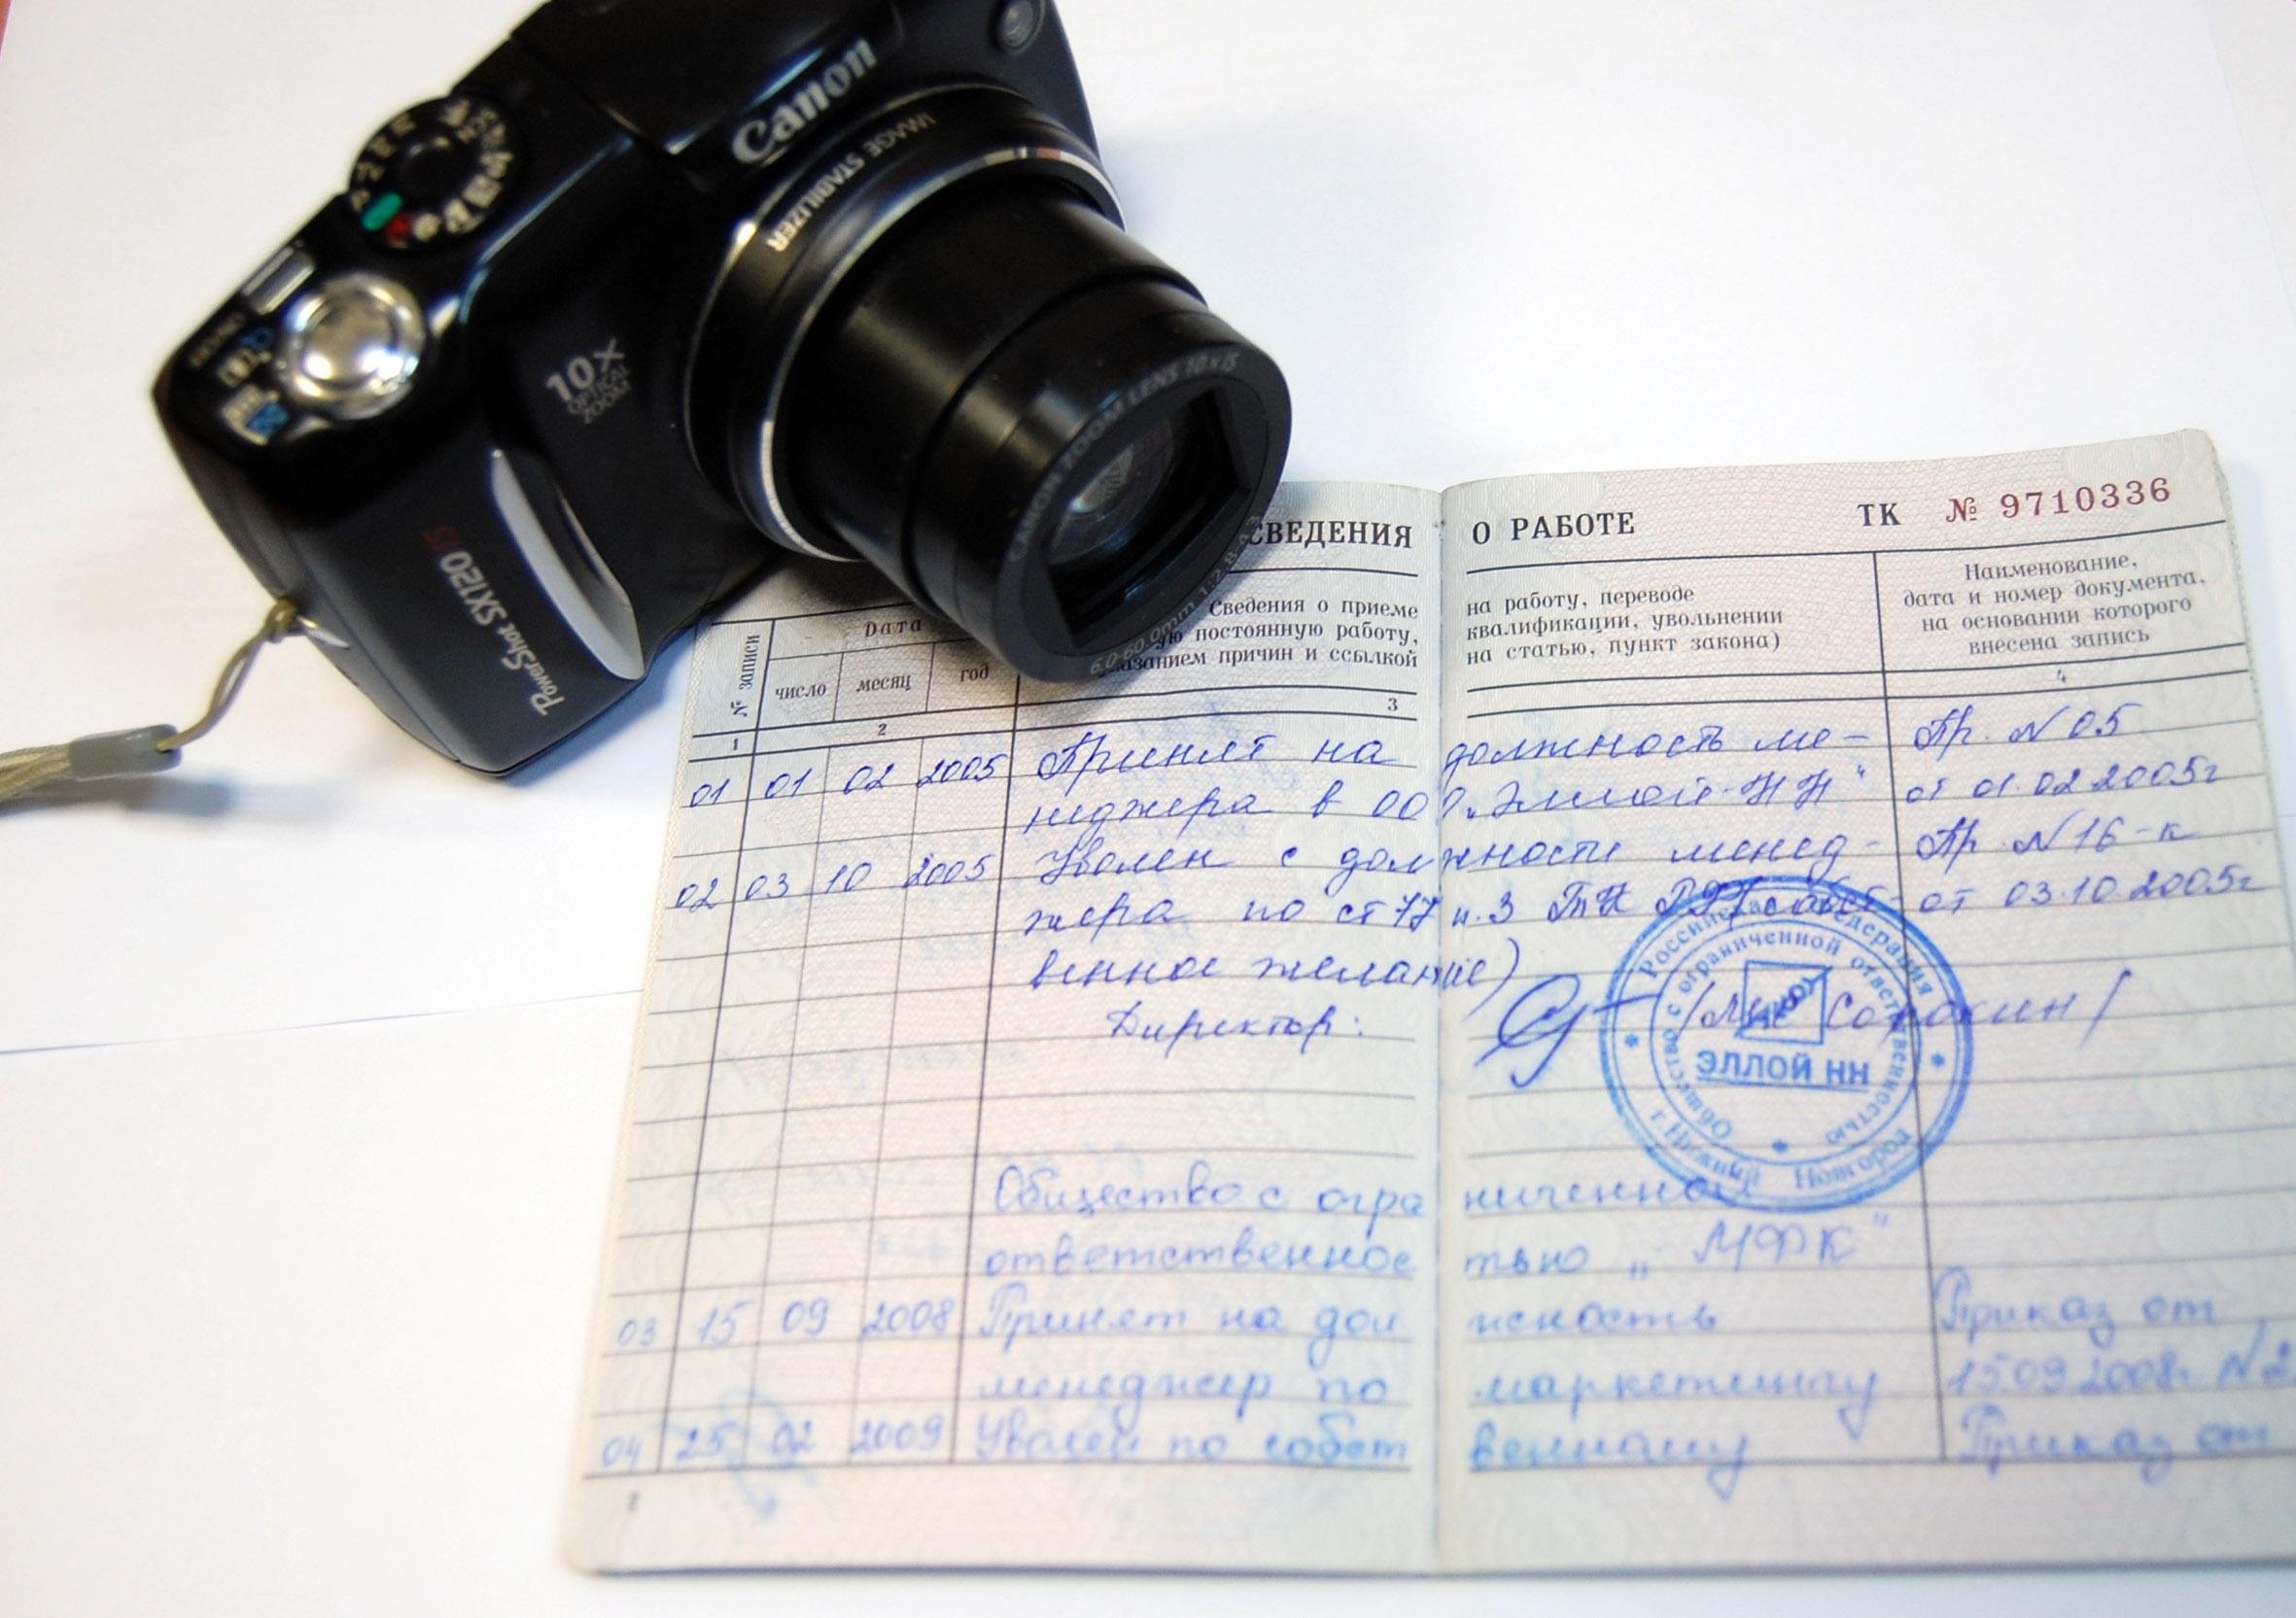 Фото или скан документов